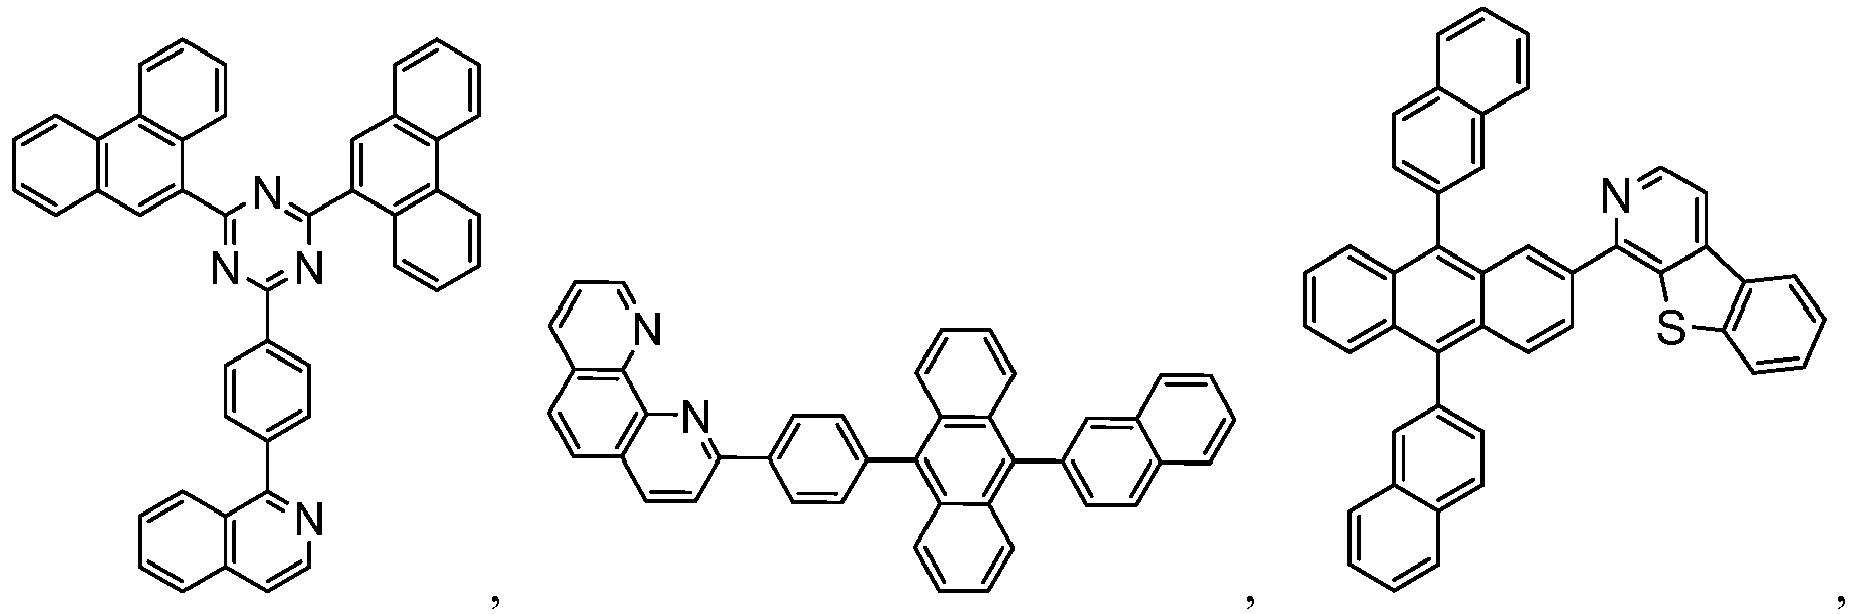 Figure imgb0945